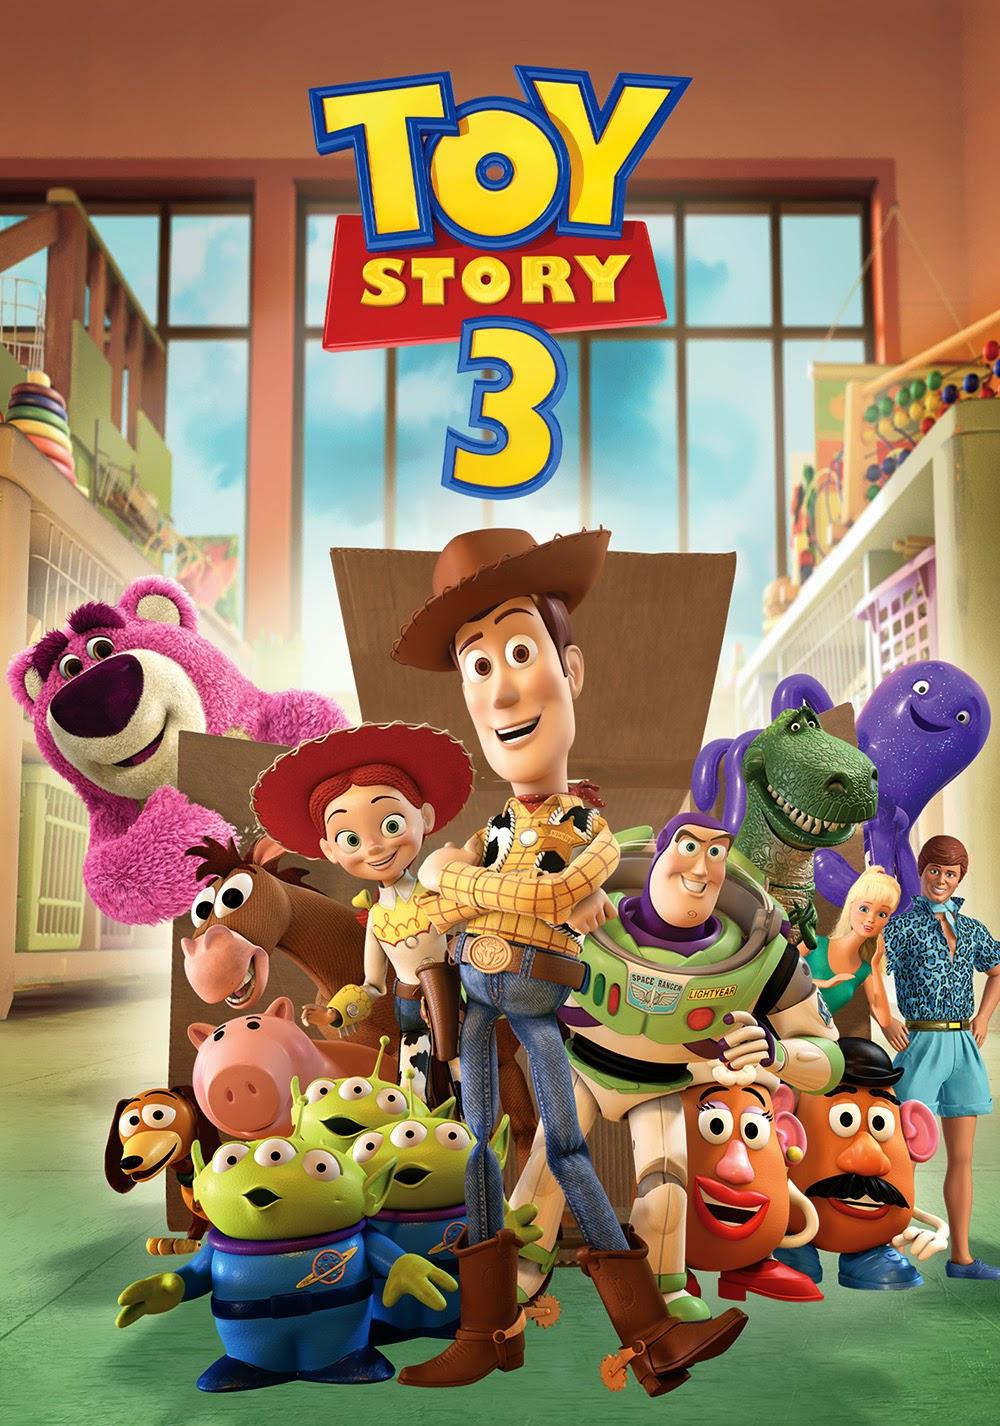 Toy Story 4 Movie : Sorry katy perry utopia magazine toy story movie